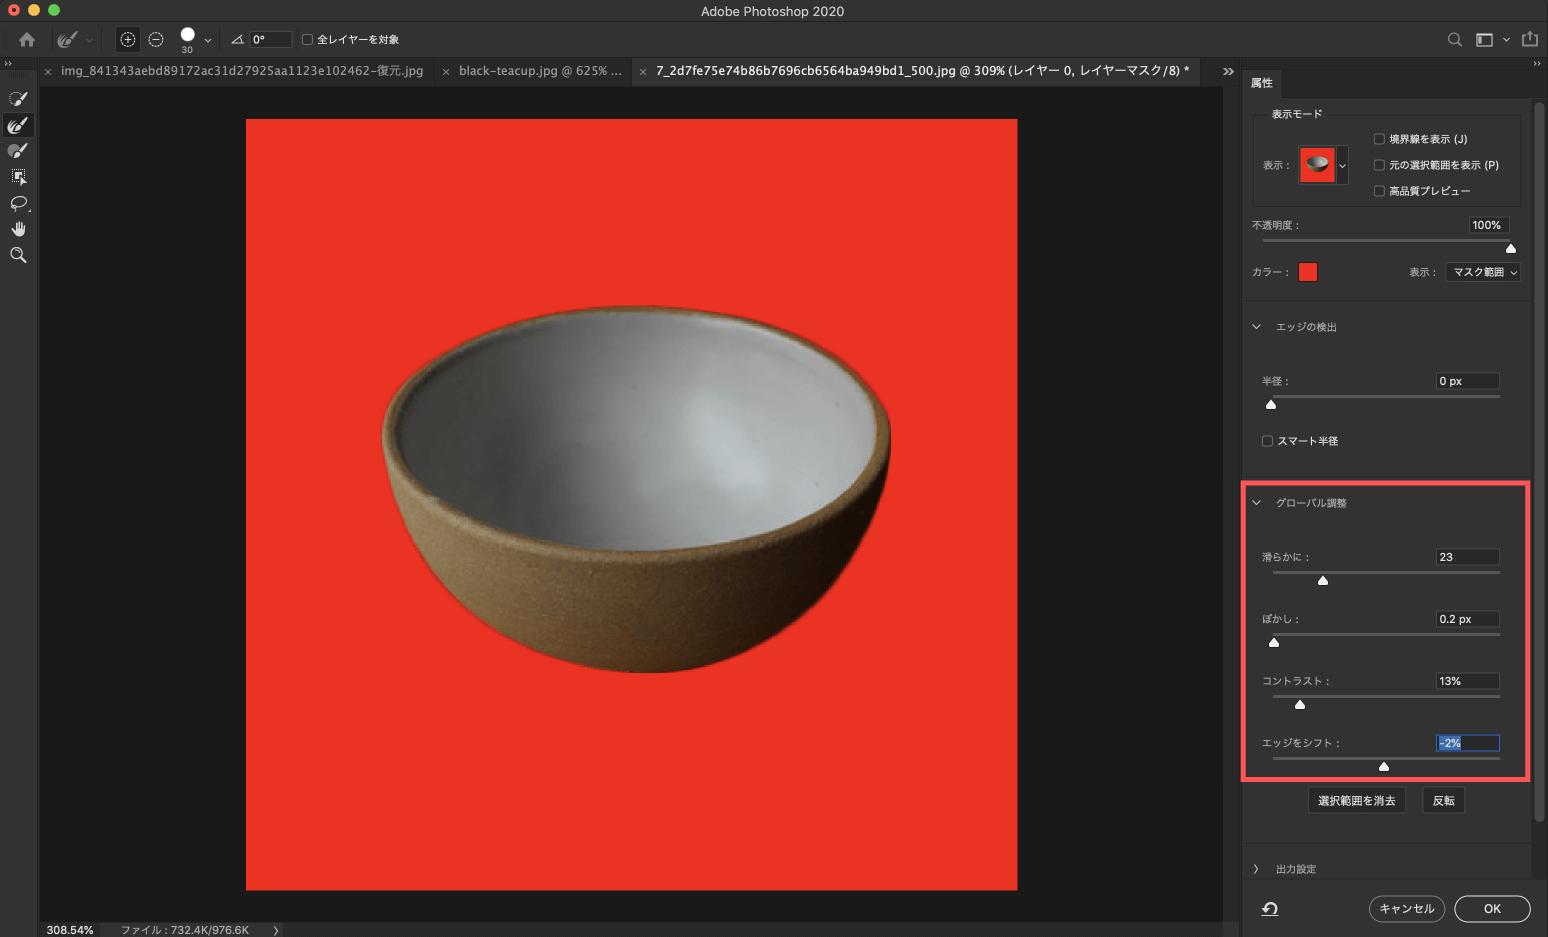 Adobe CC Photoshop フォトショップ 切り抜き 髪の毛 簡単 切り抜き 選択とマスクのグローバルメニュー